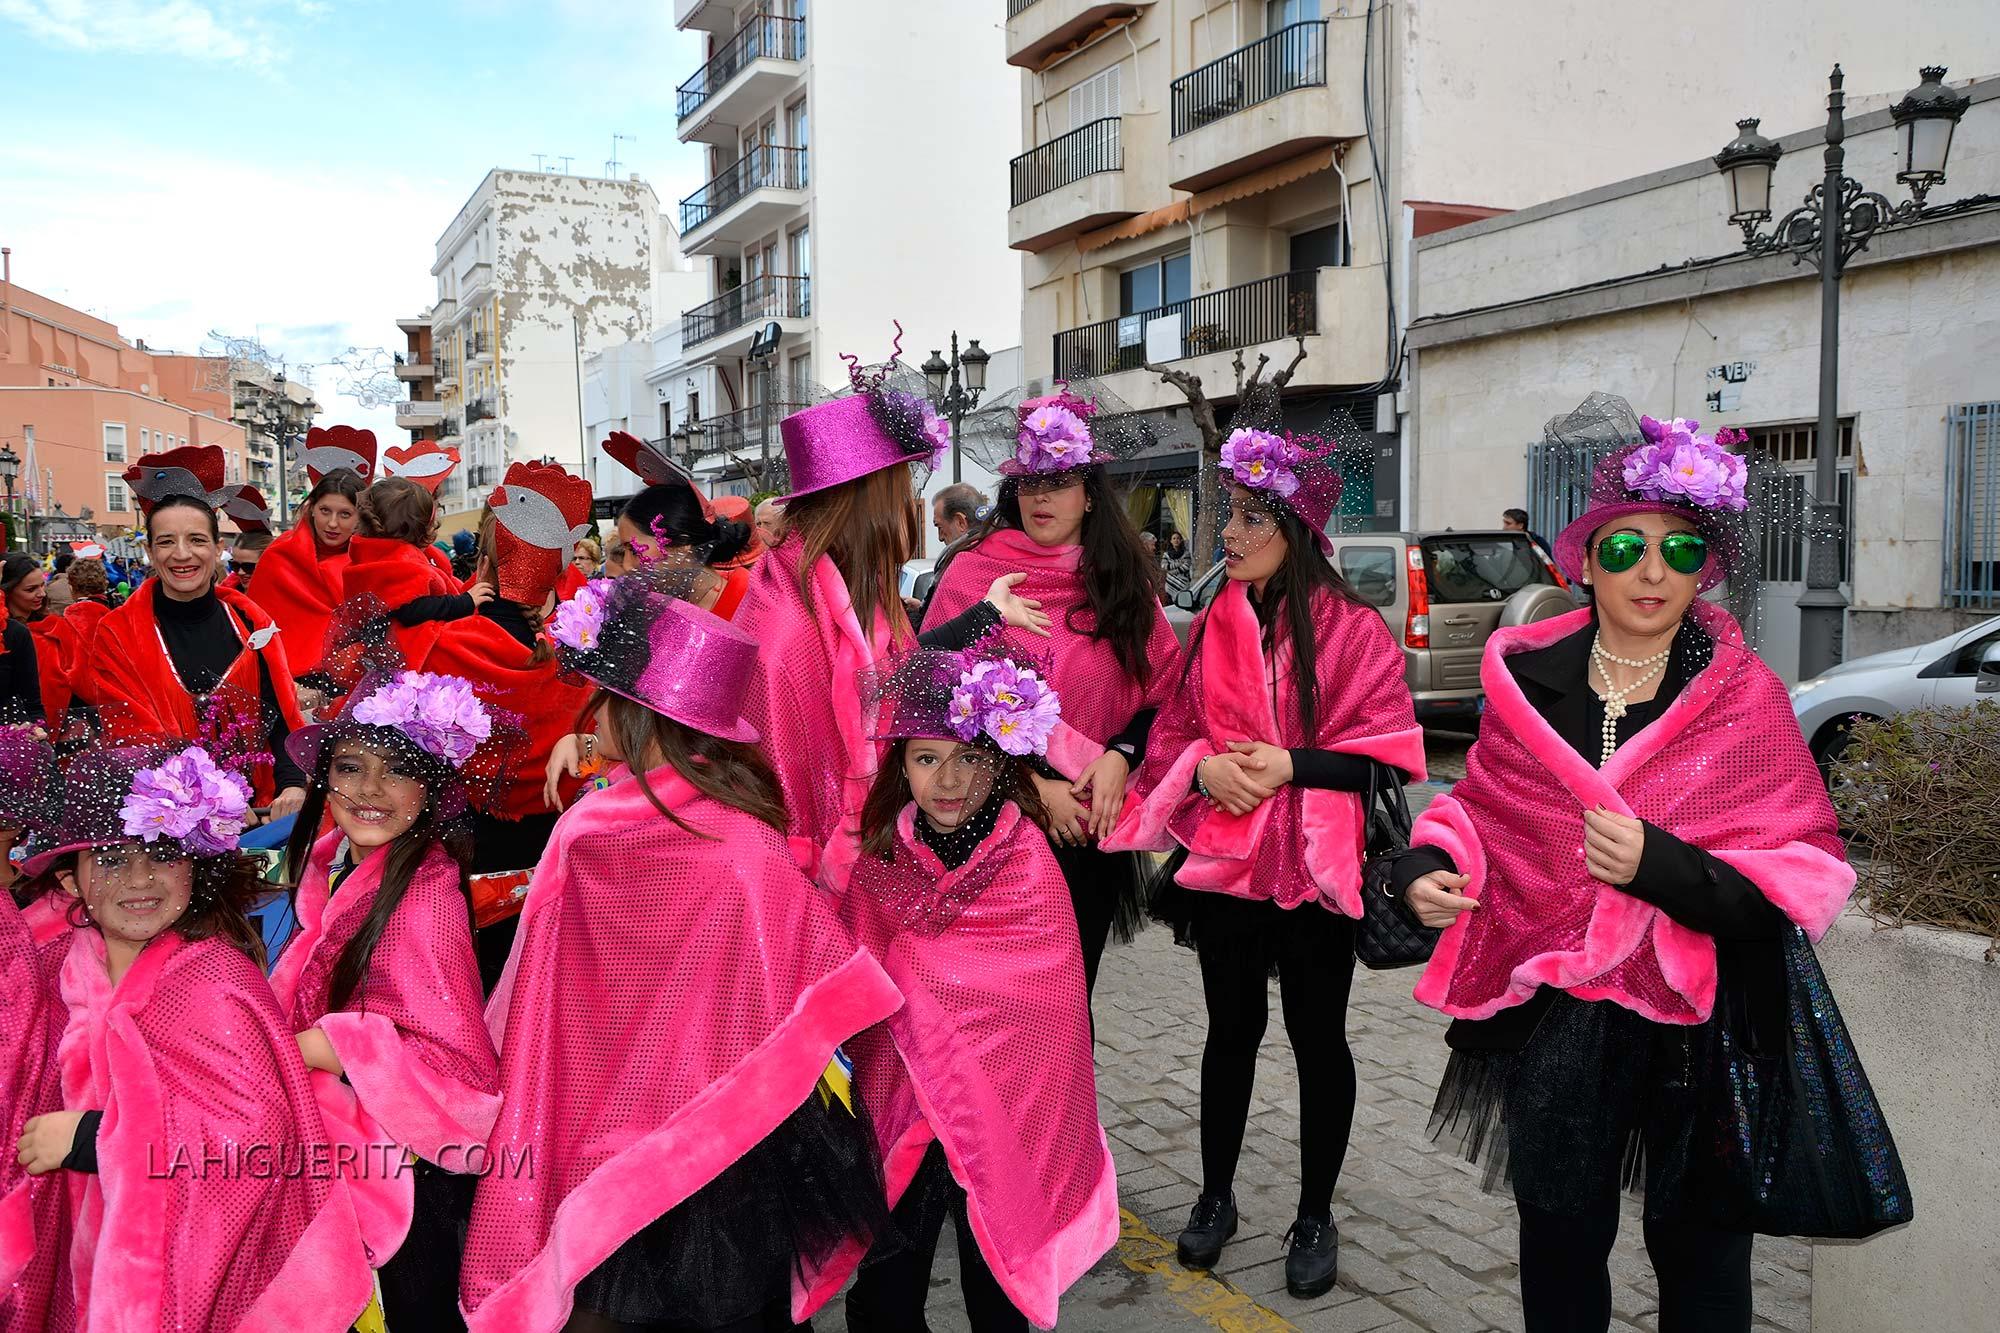 Cabalgata infantil de viudas carnaval de Isla cristina 2016 _DSC1873